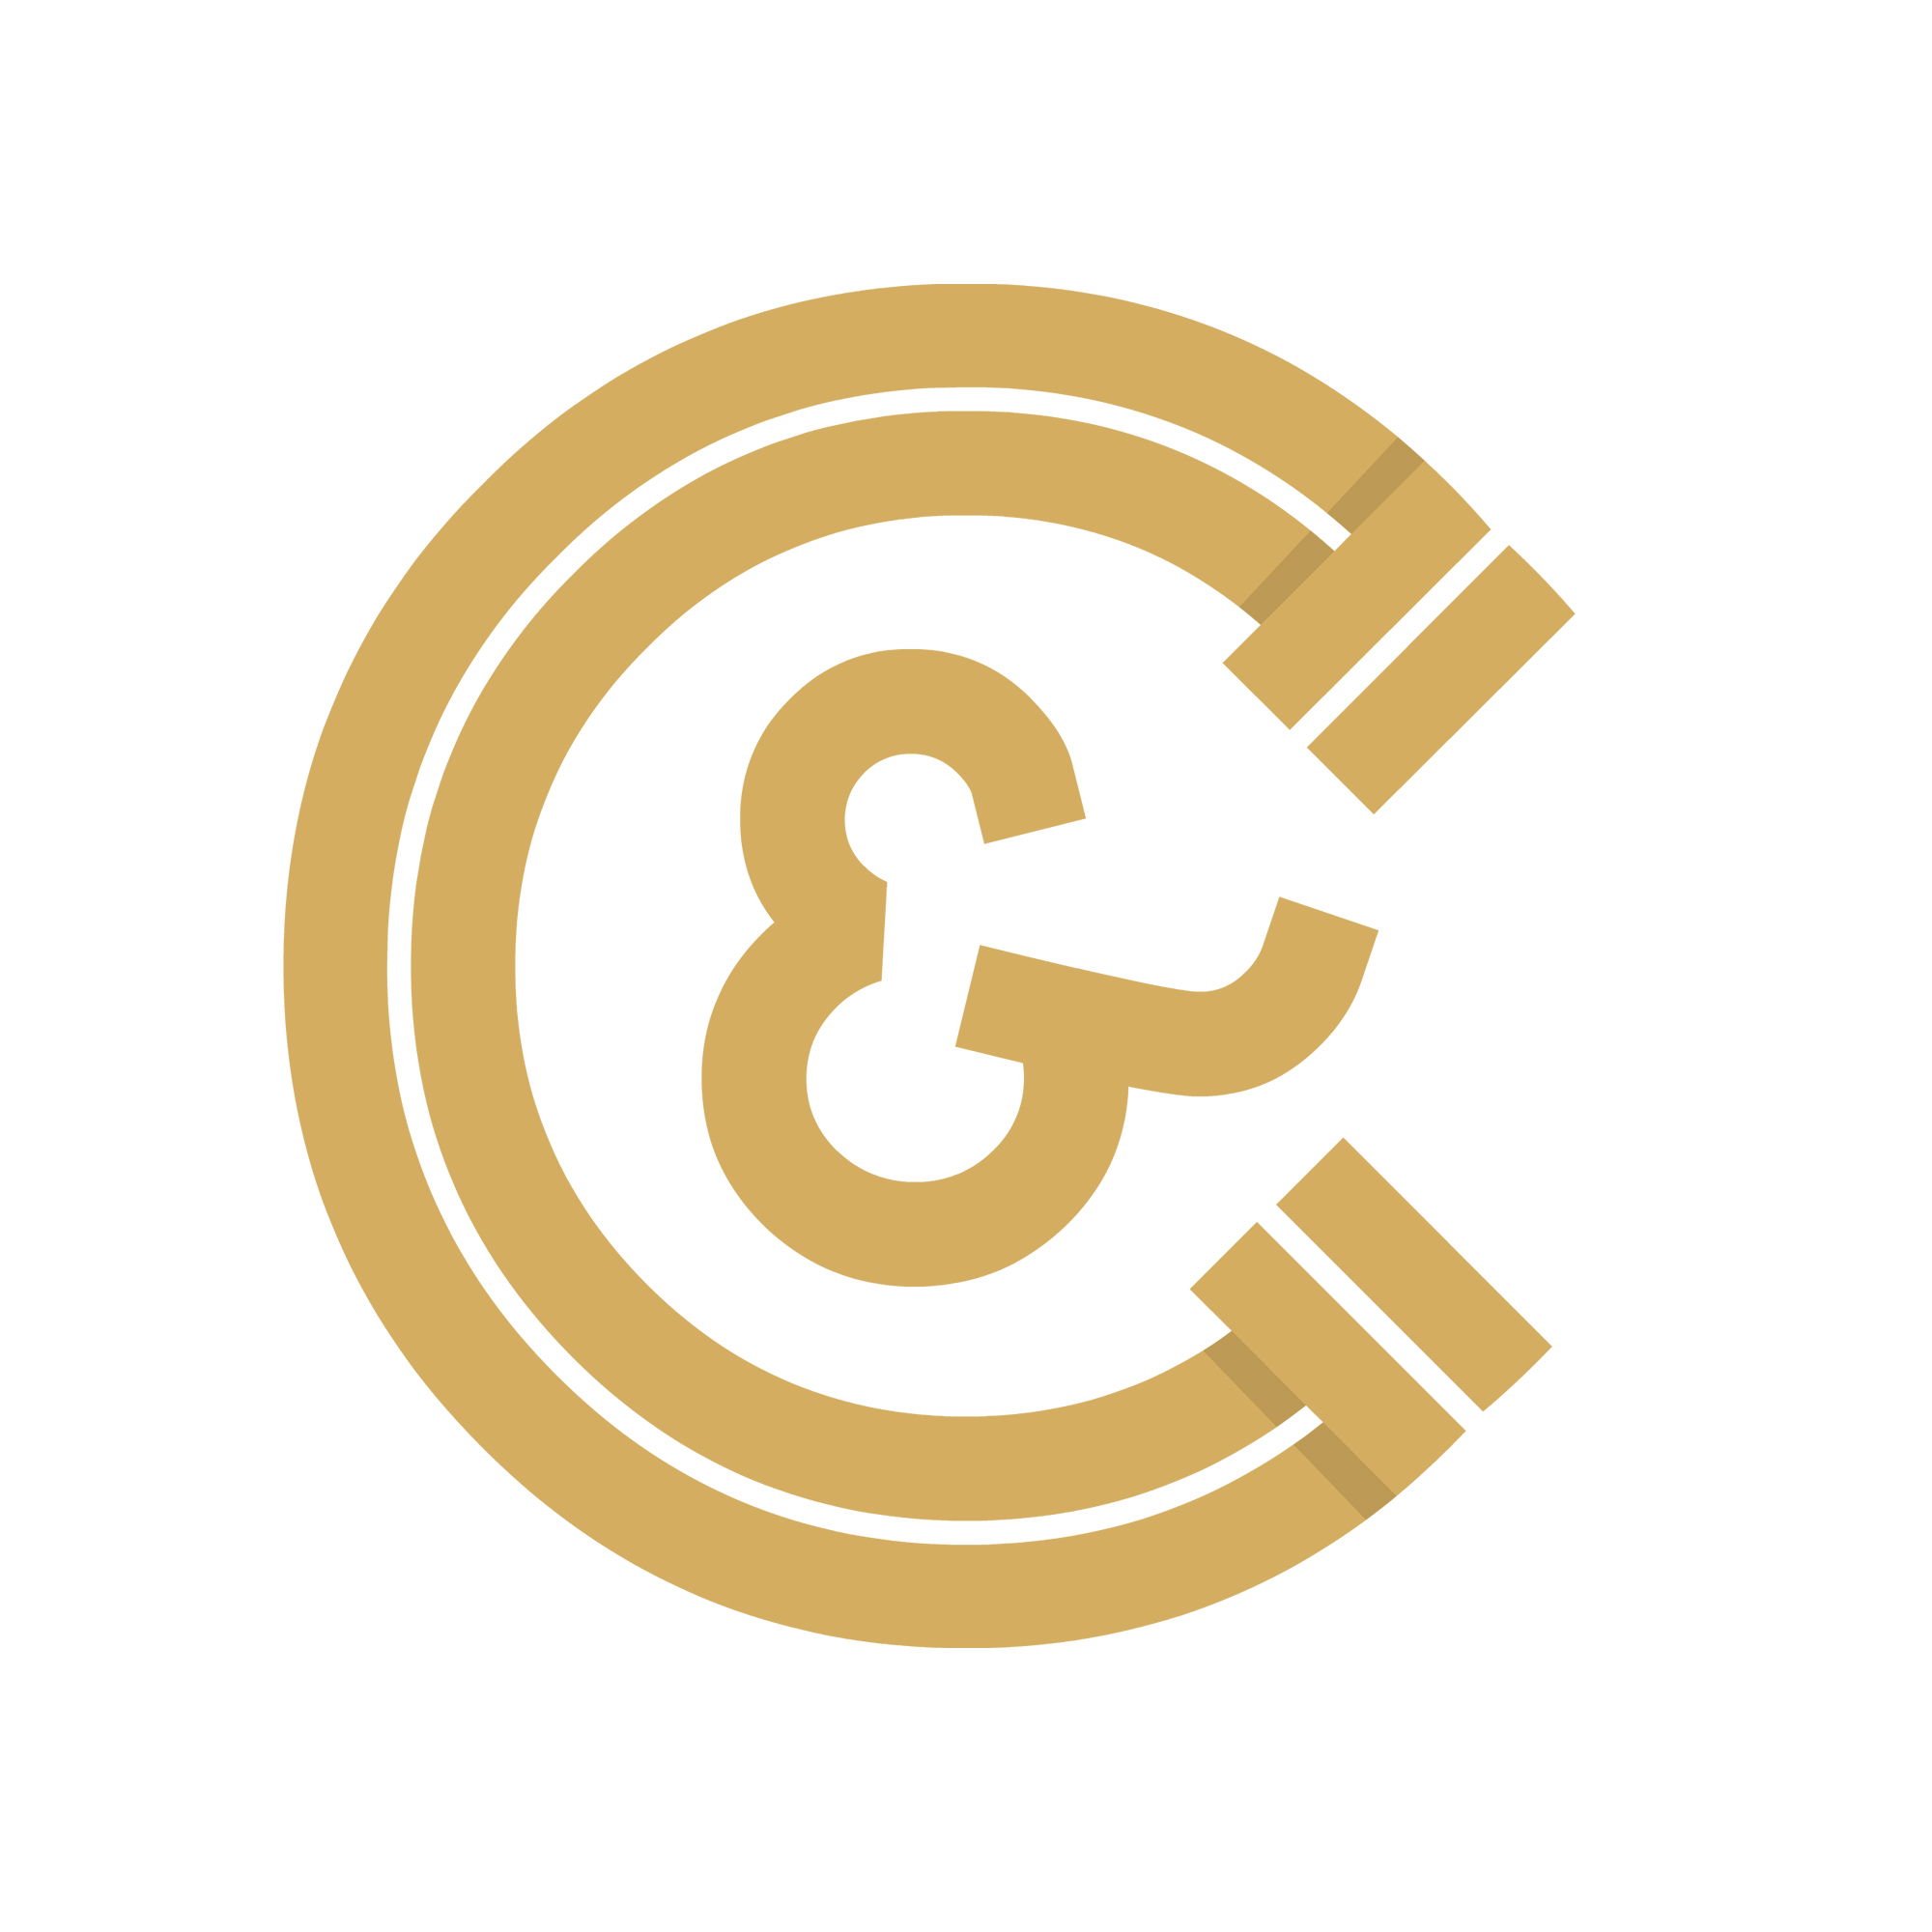 CC_icon